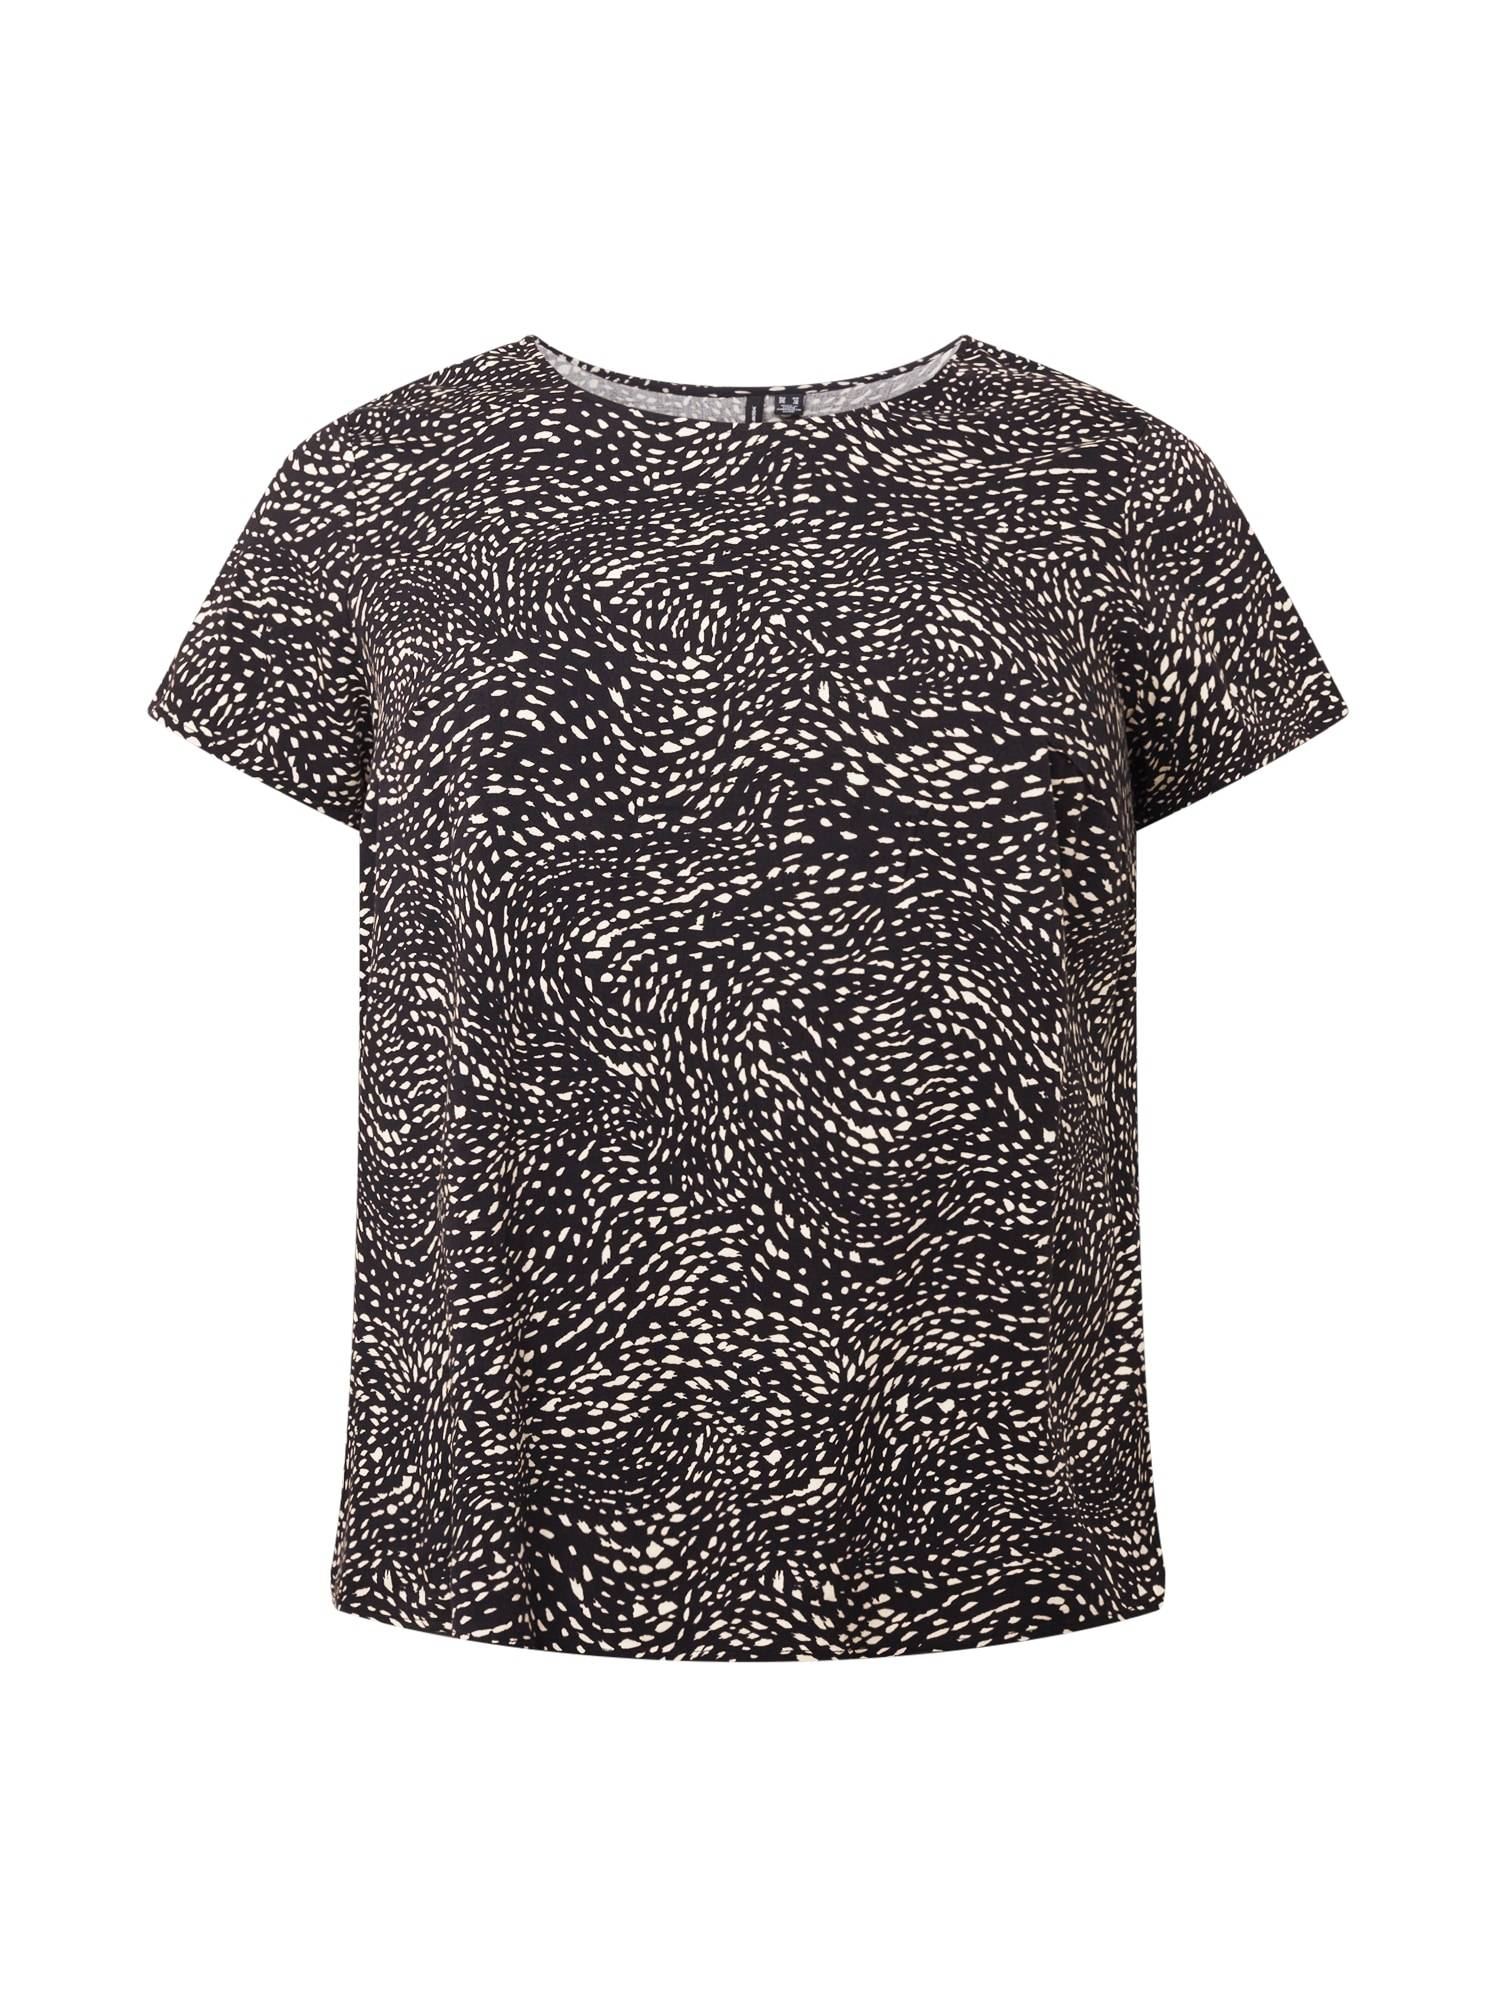 Vero Moda Curve T-shirt 'BACA'  - Noir - Taille: 50 - female